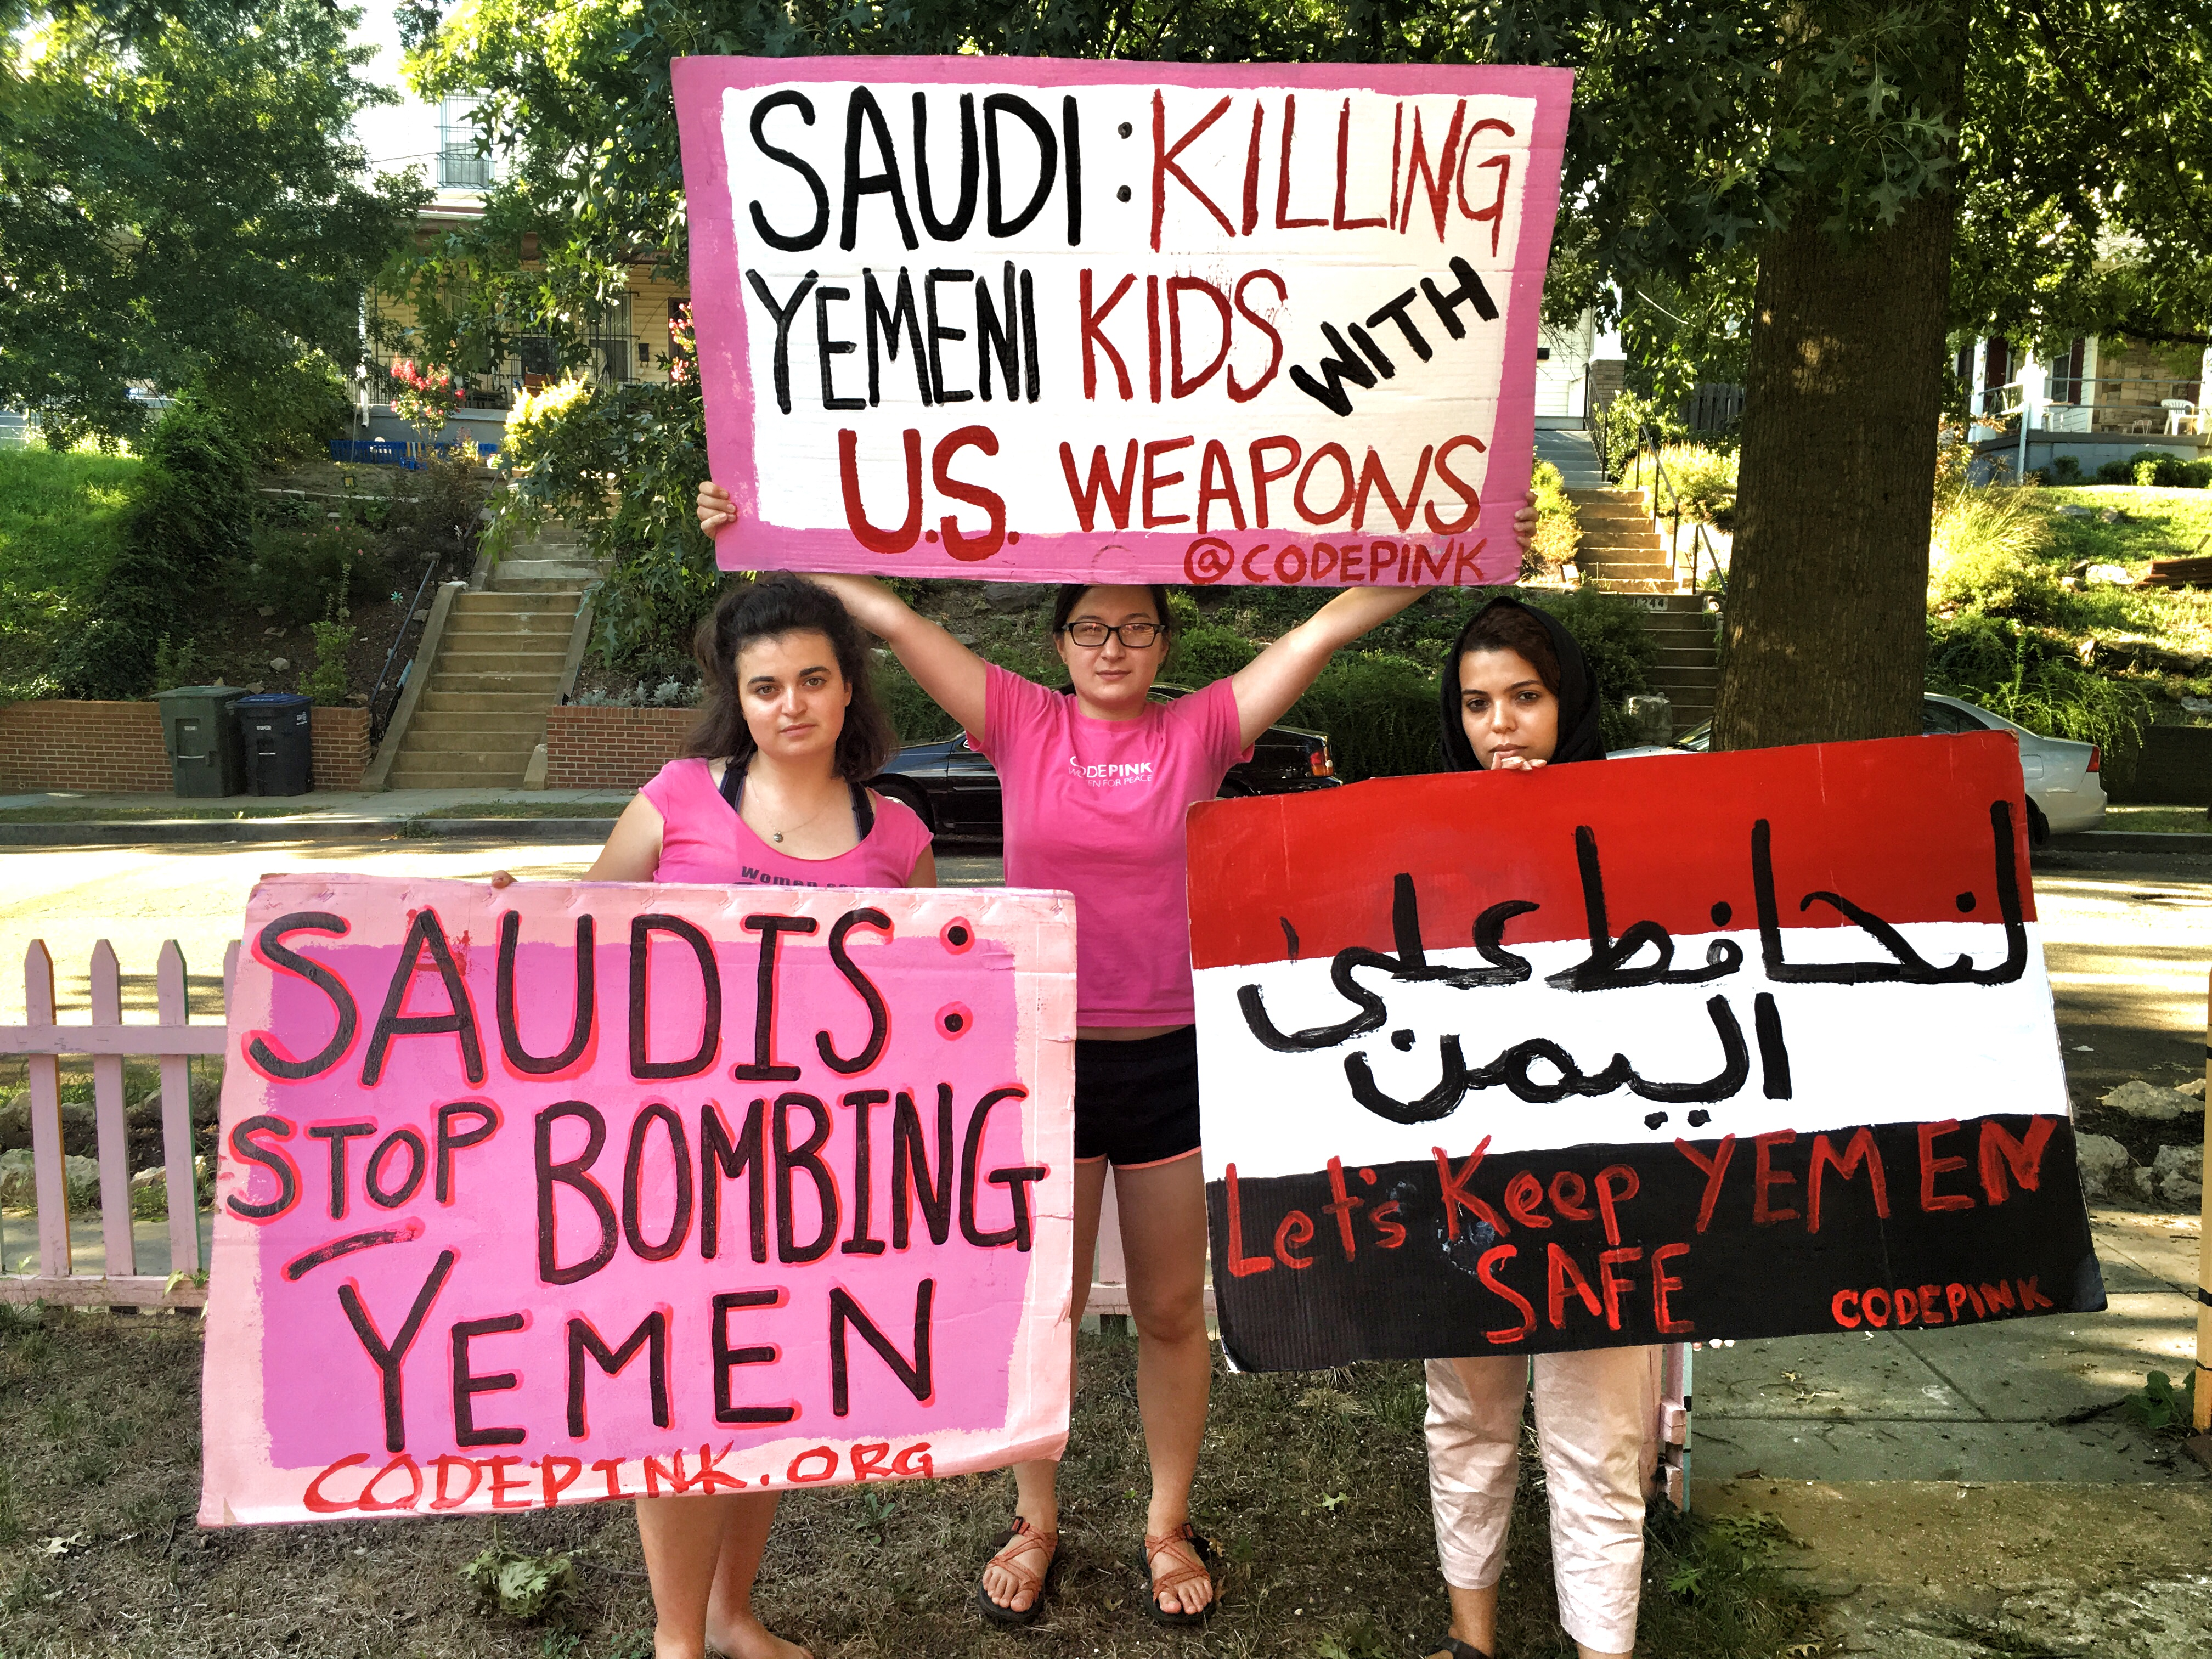 Saudi-killings.jpg